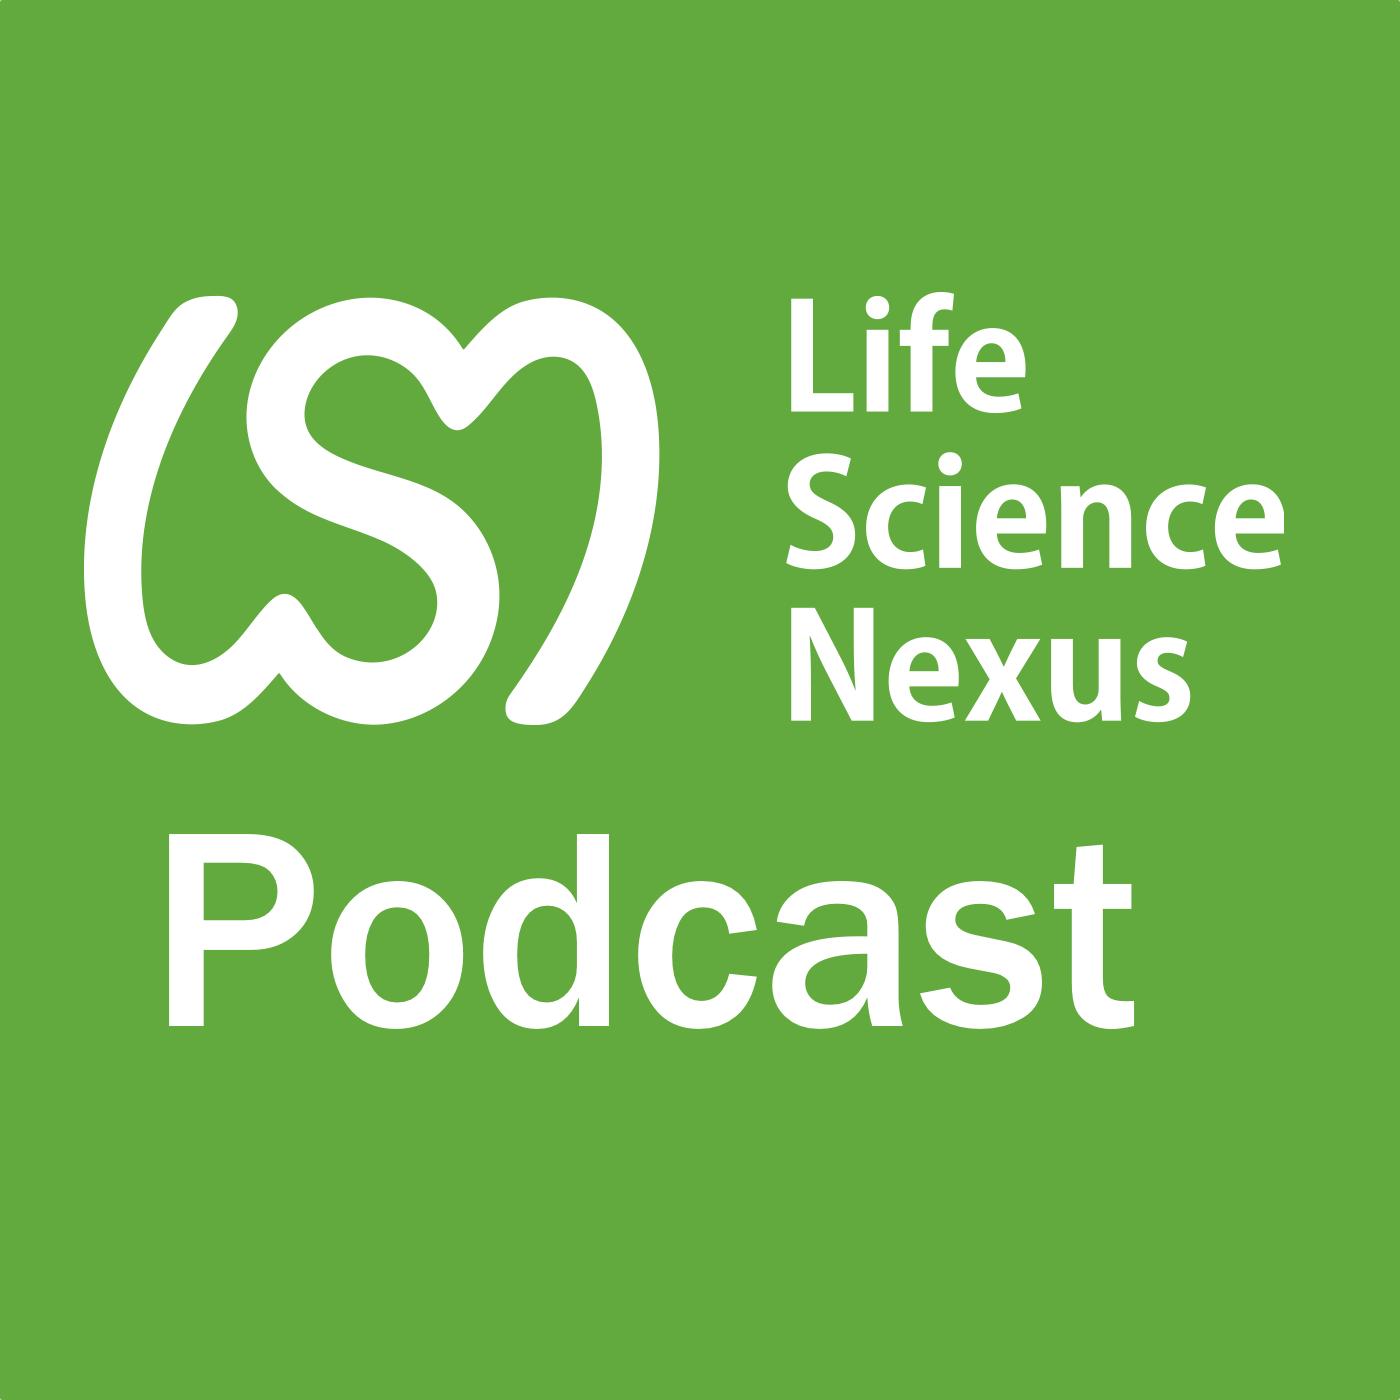 LSN Podcast - Life Science Nexus